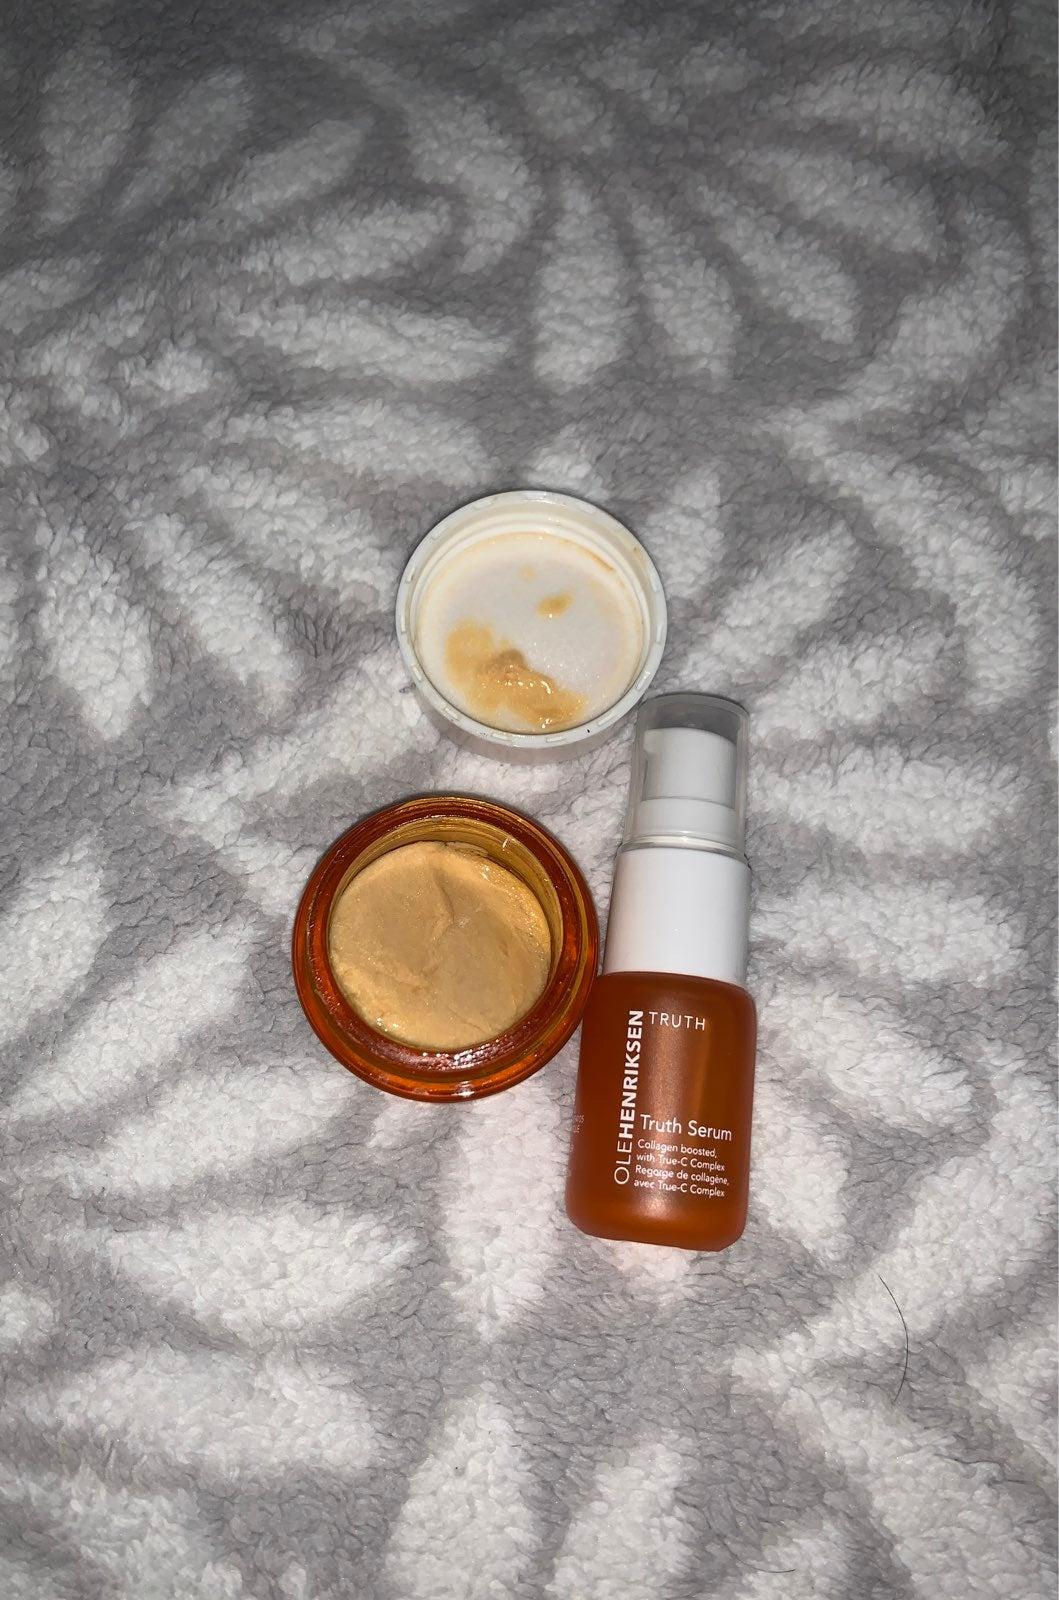 olehenriksen eye cream & serum (read)